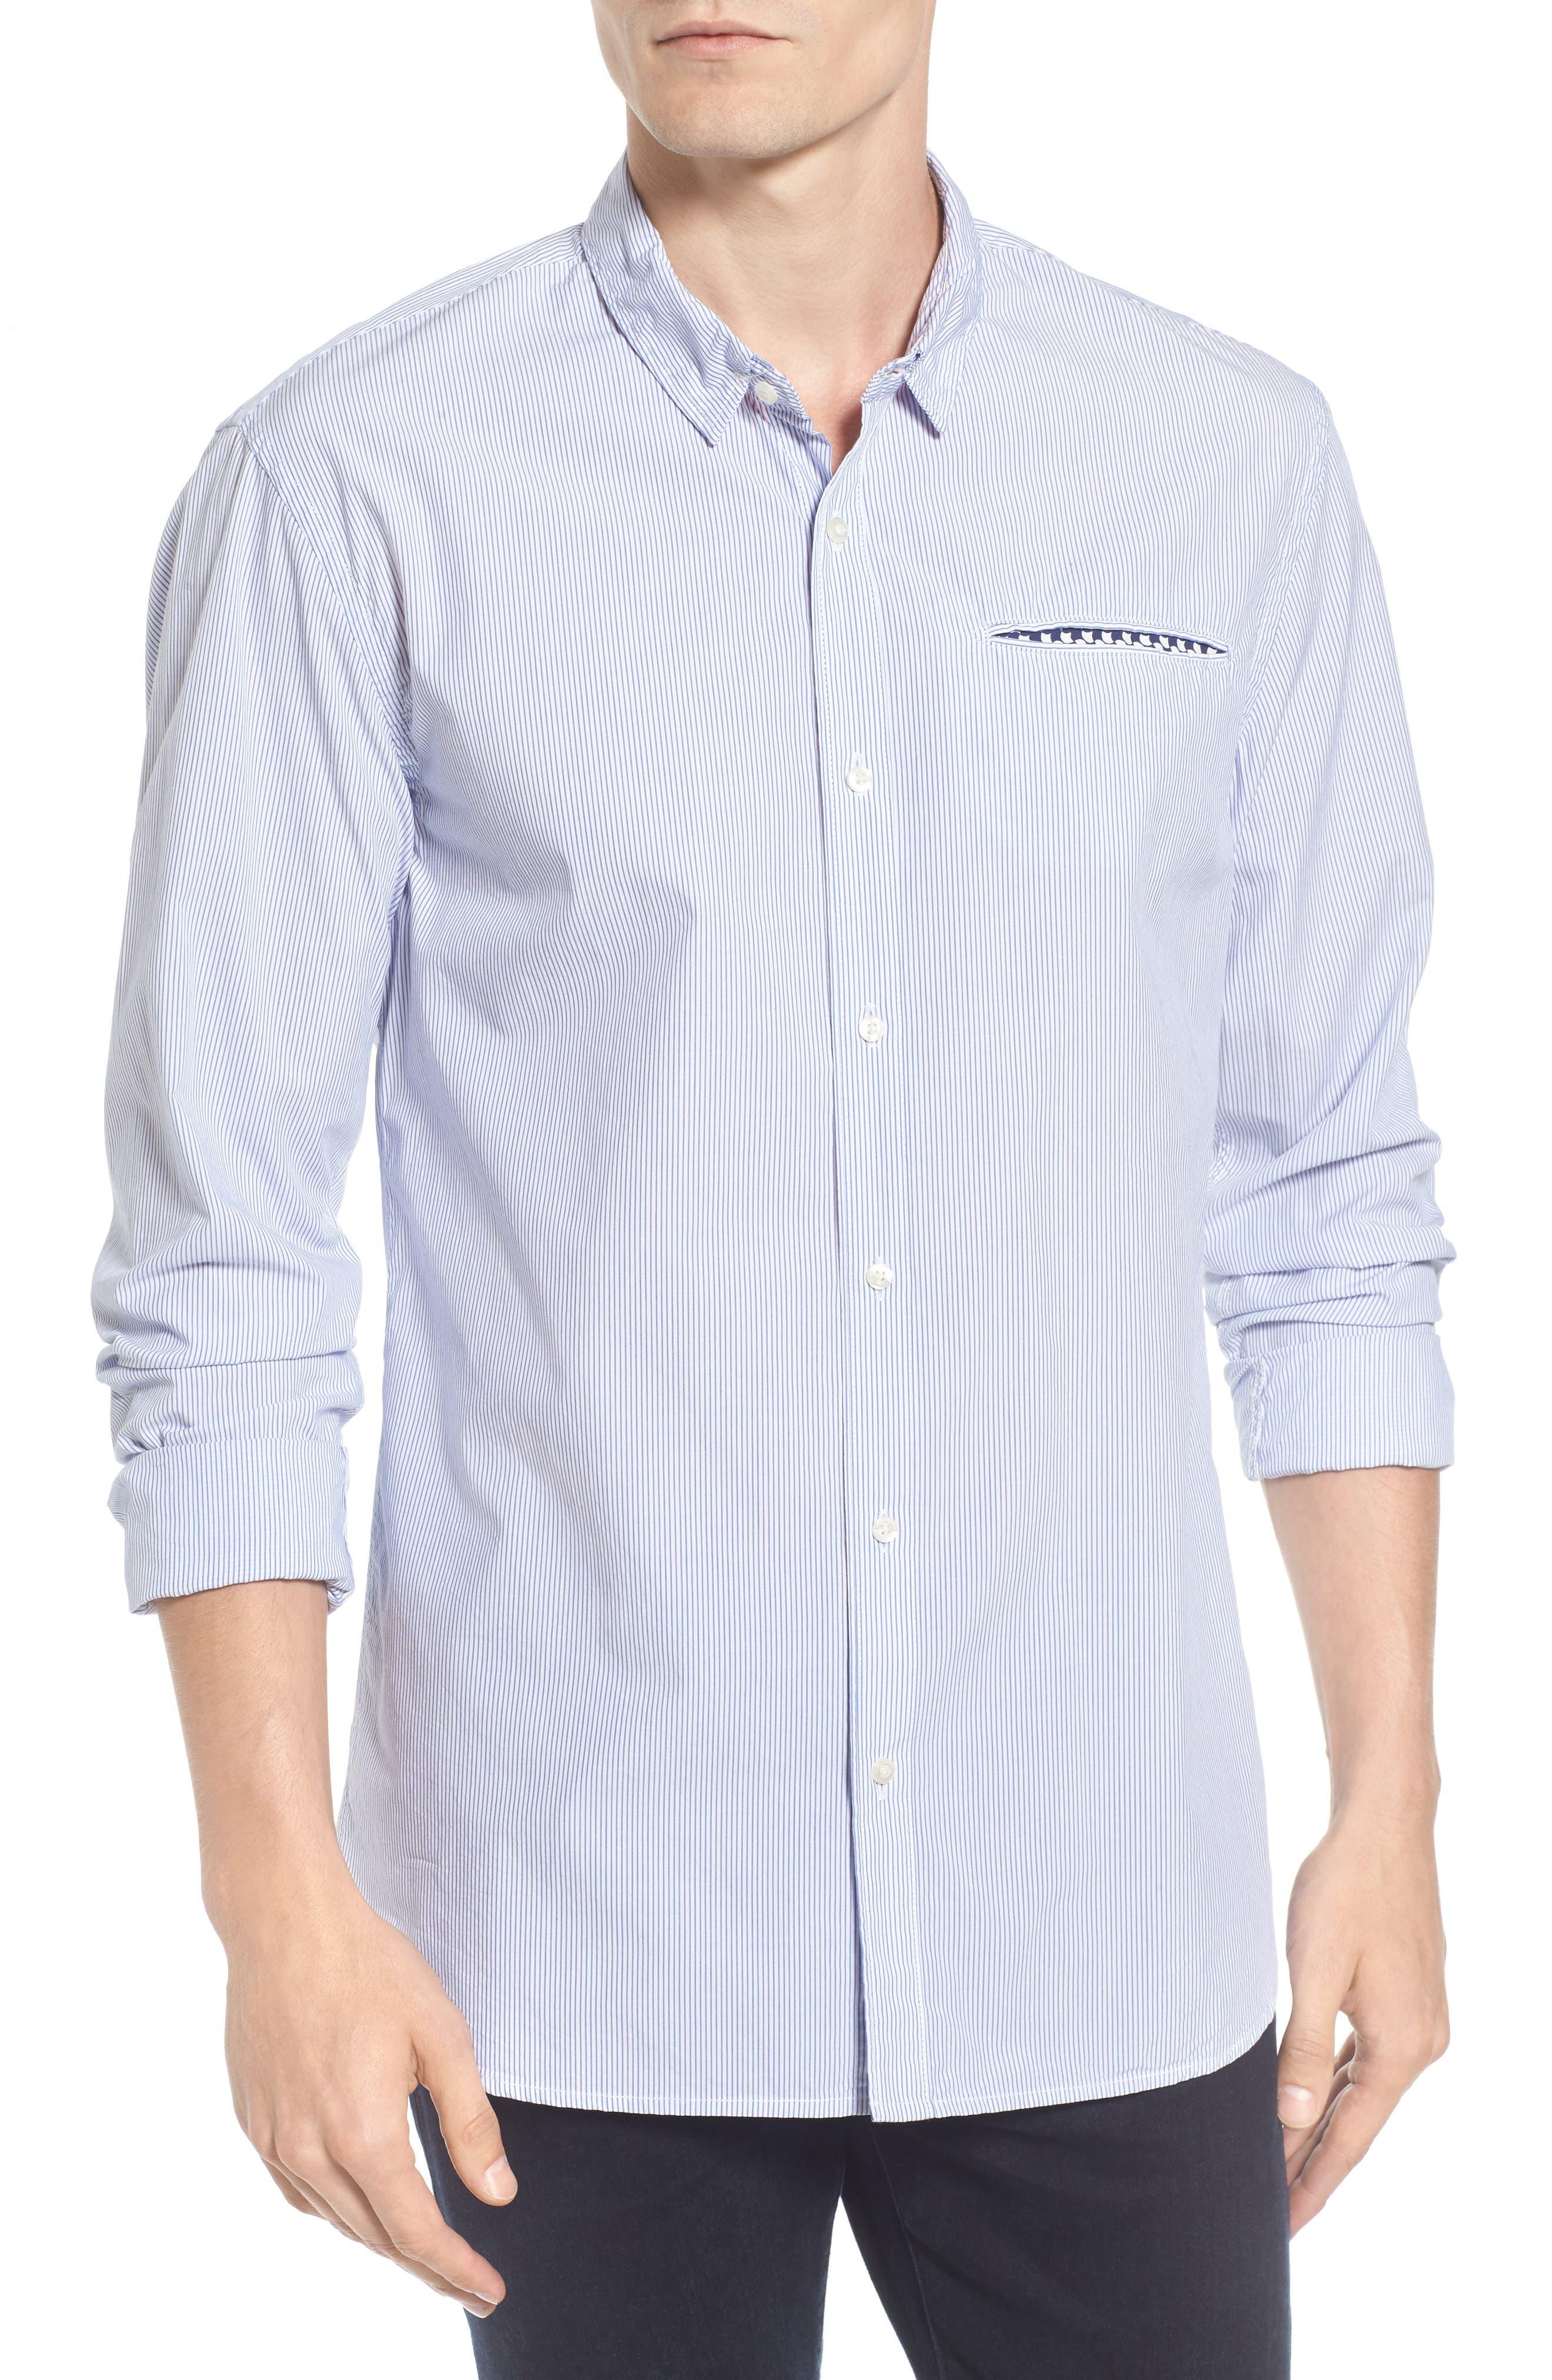 Woven Stripe Shirt,                         Main,                         color, White